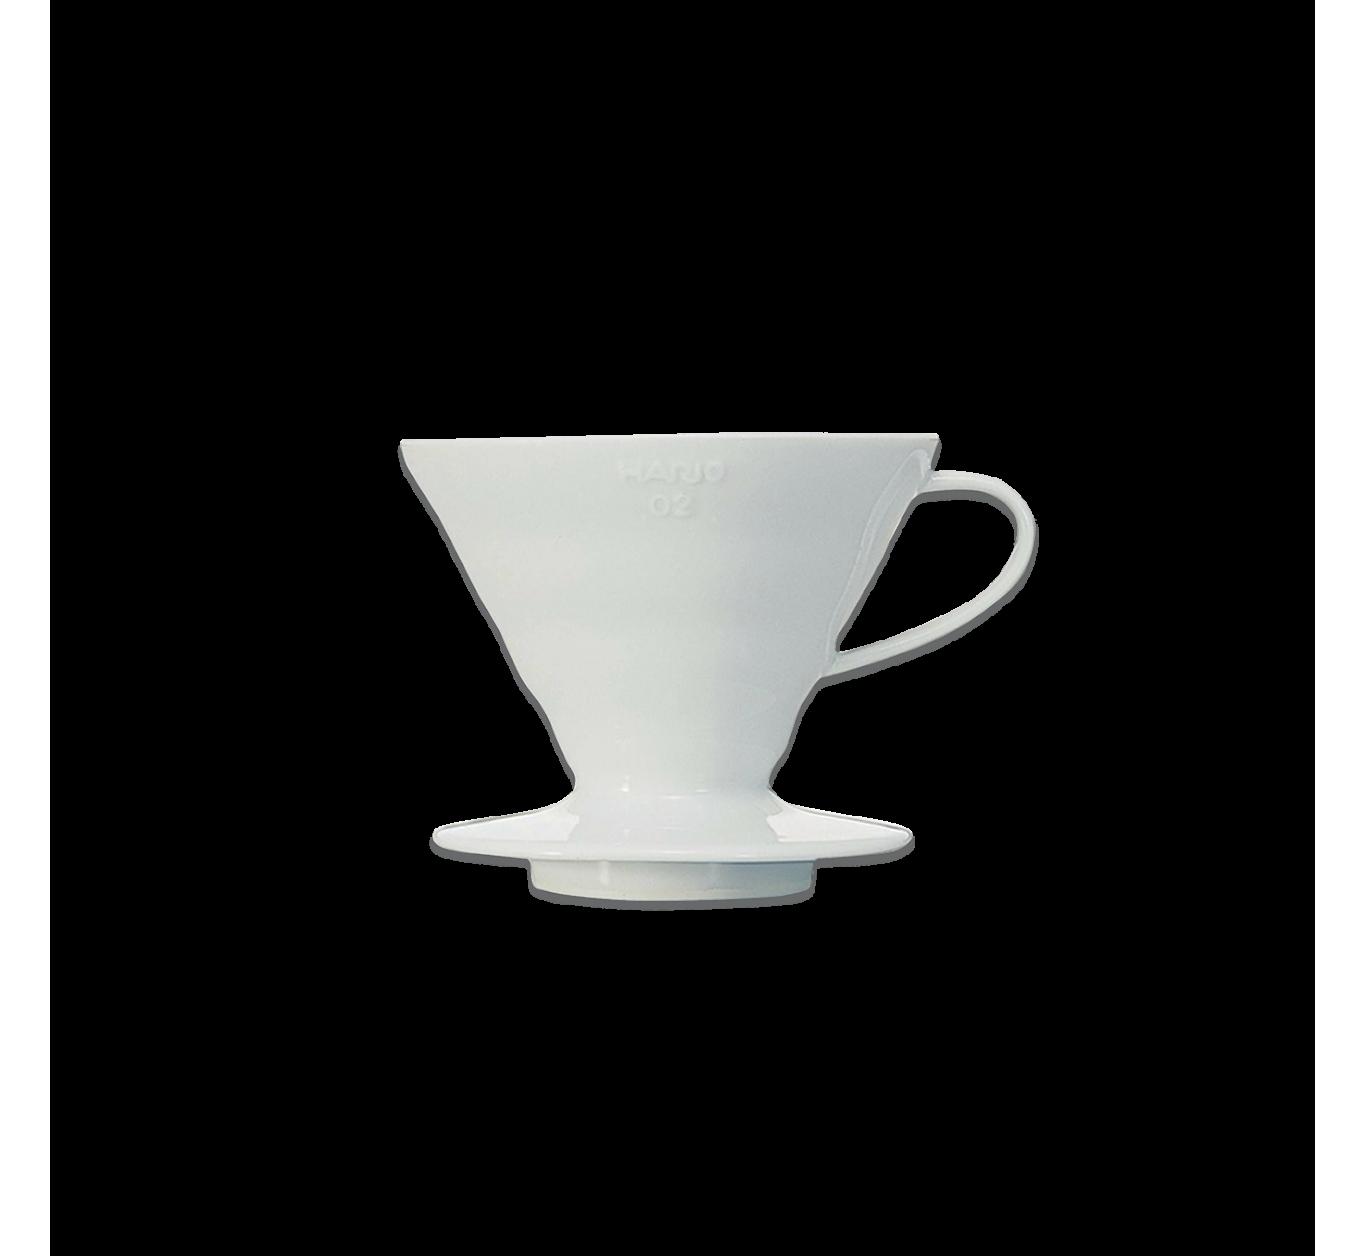 V60 céramique blanche 1/4 tasses